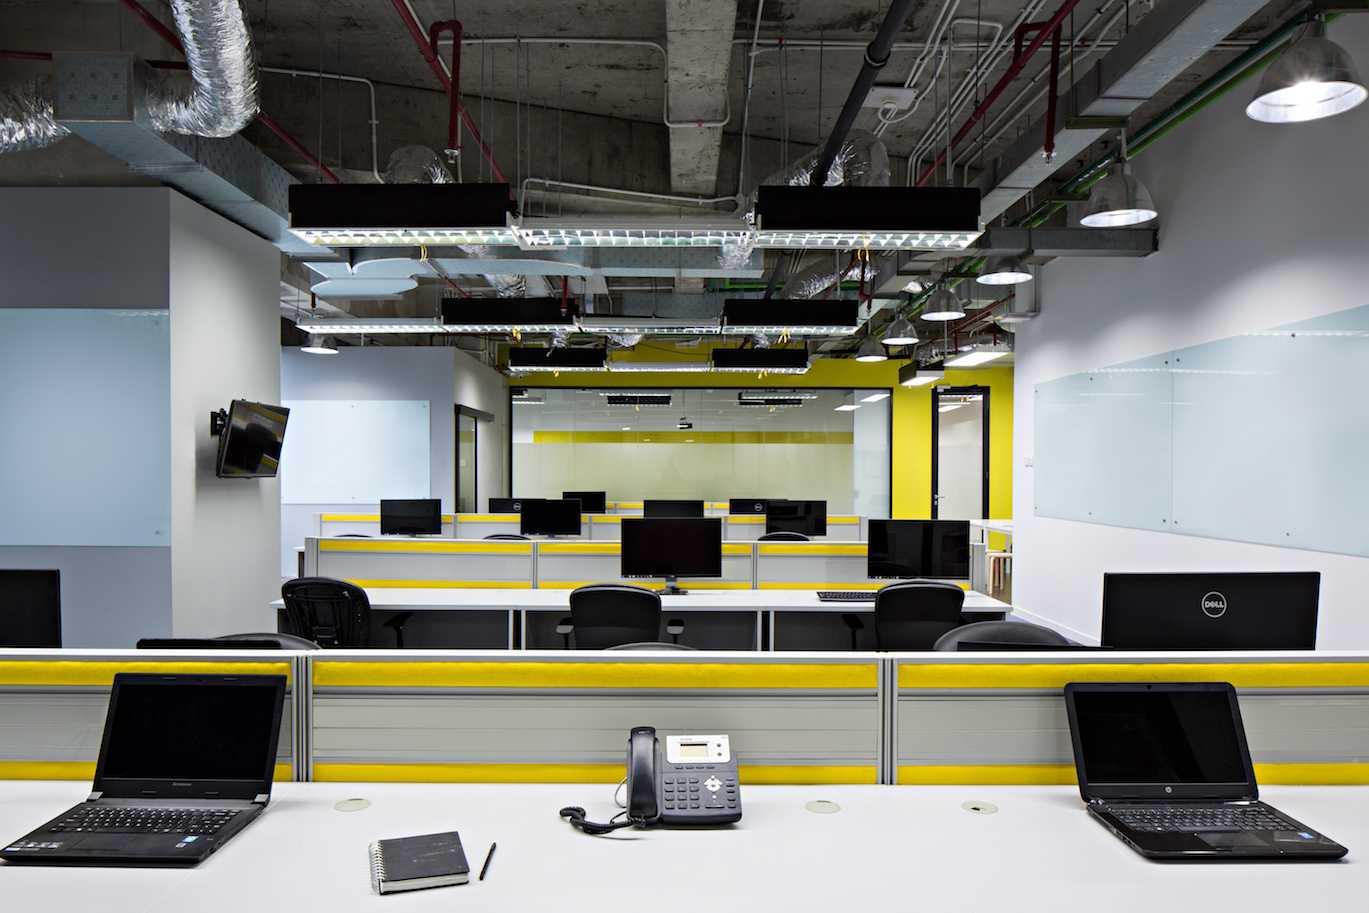 Pt Asa Adiguna Digital Alpha Indonesia Office 88 Building Office 88 Building Working Area  24564